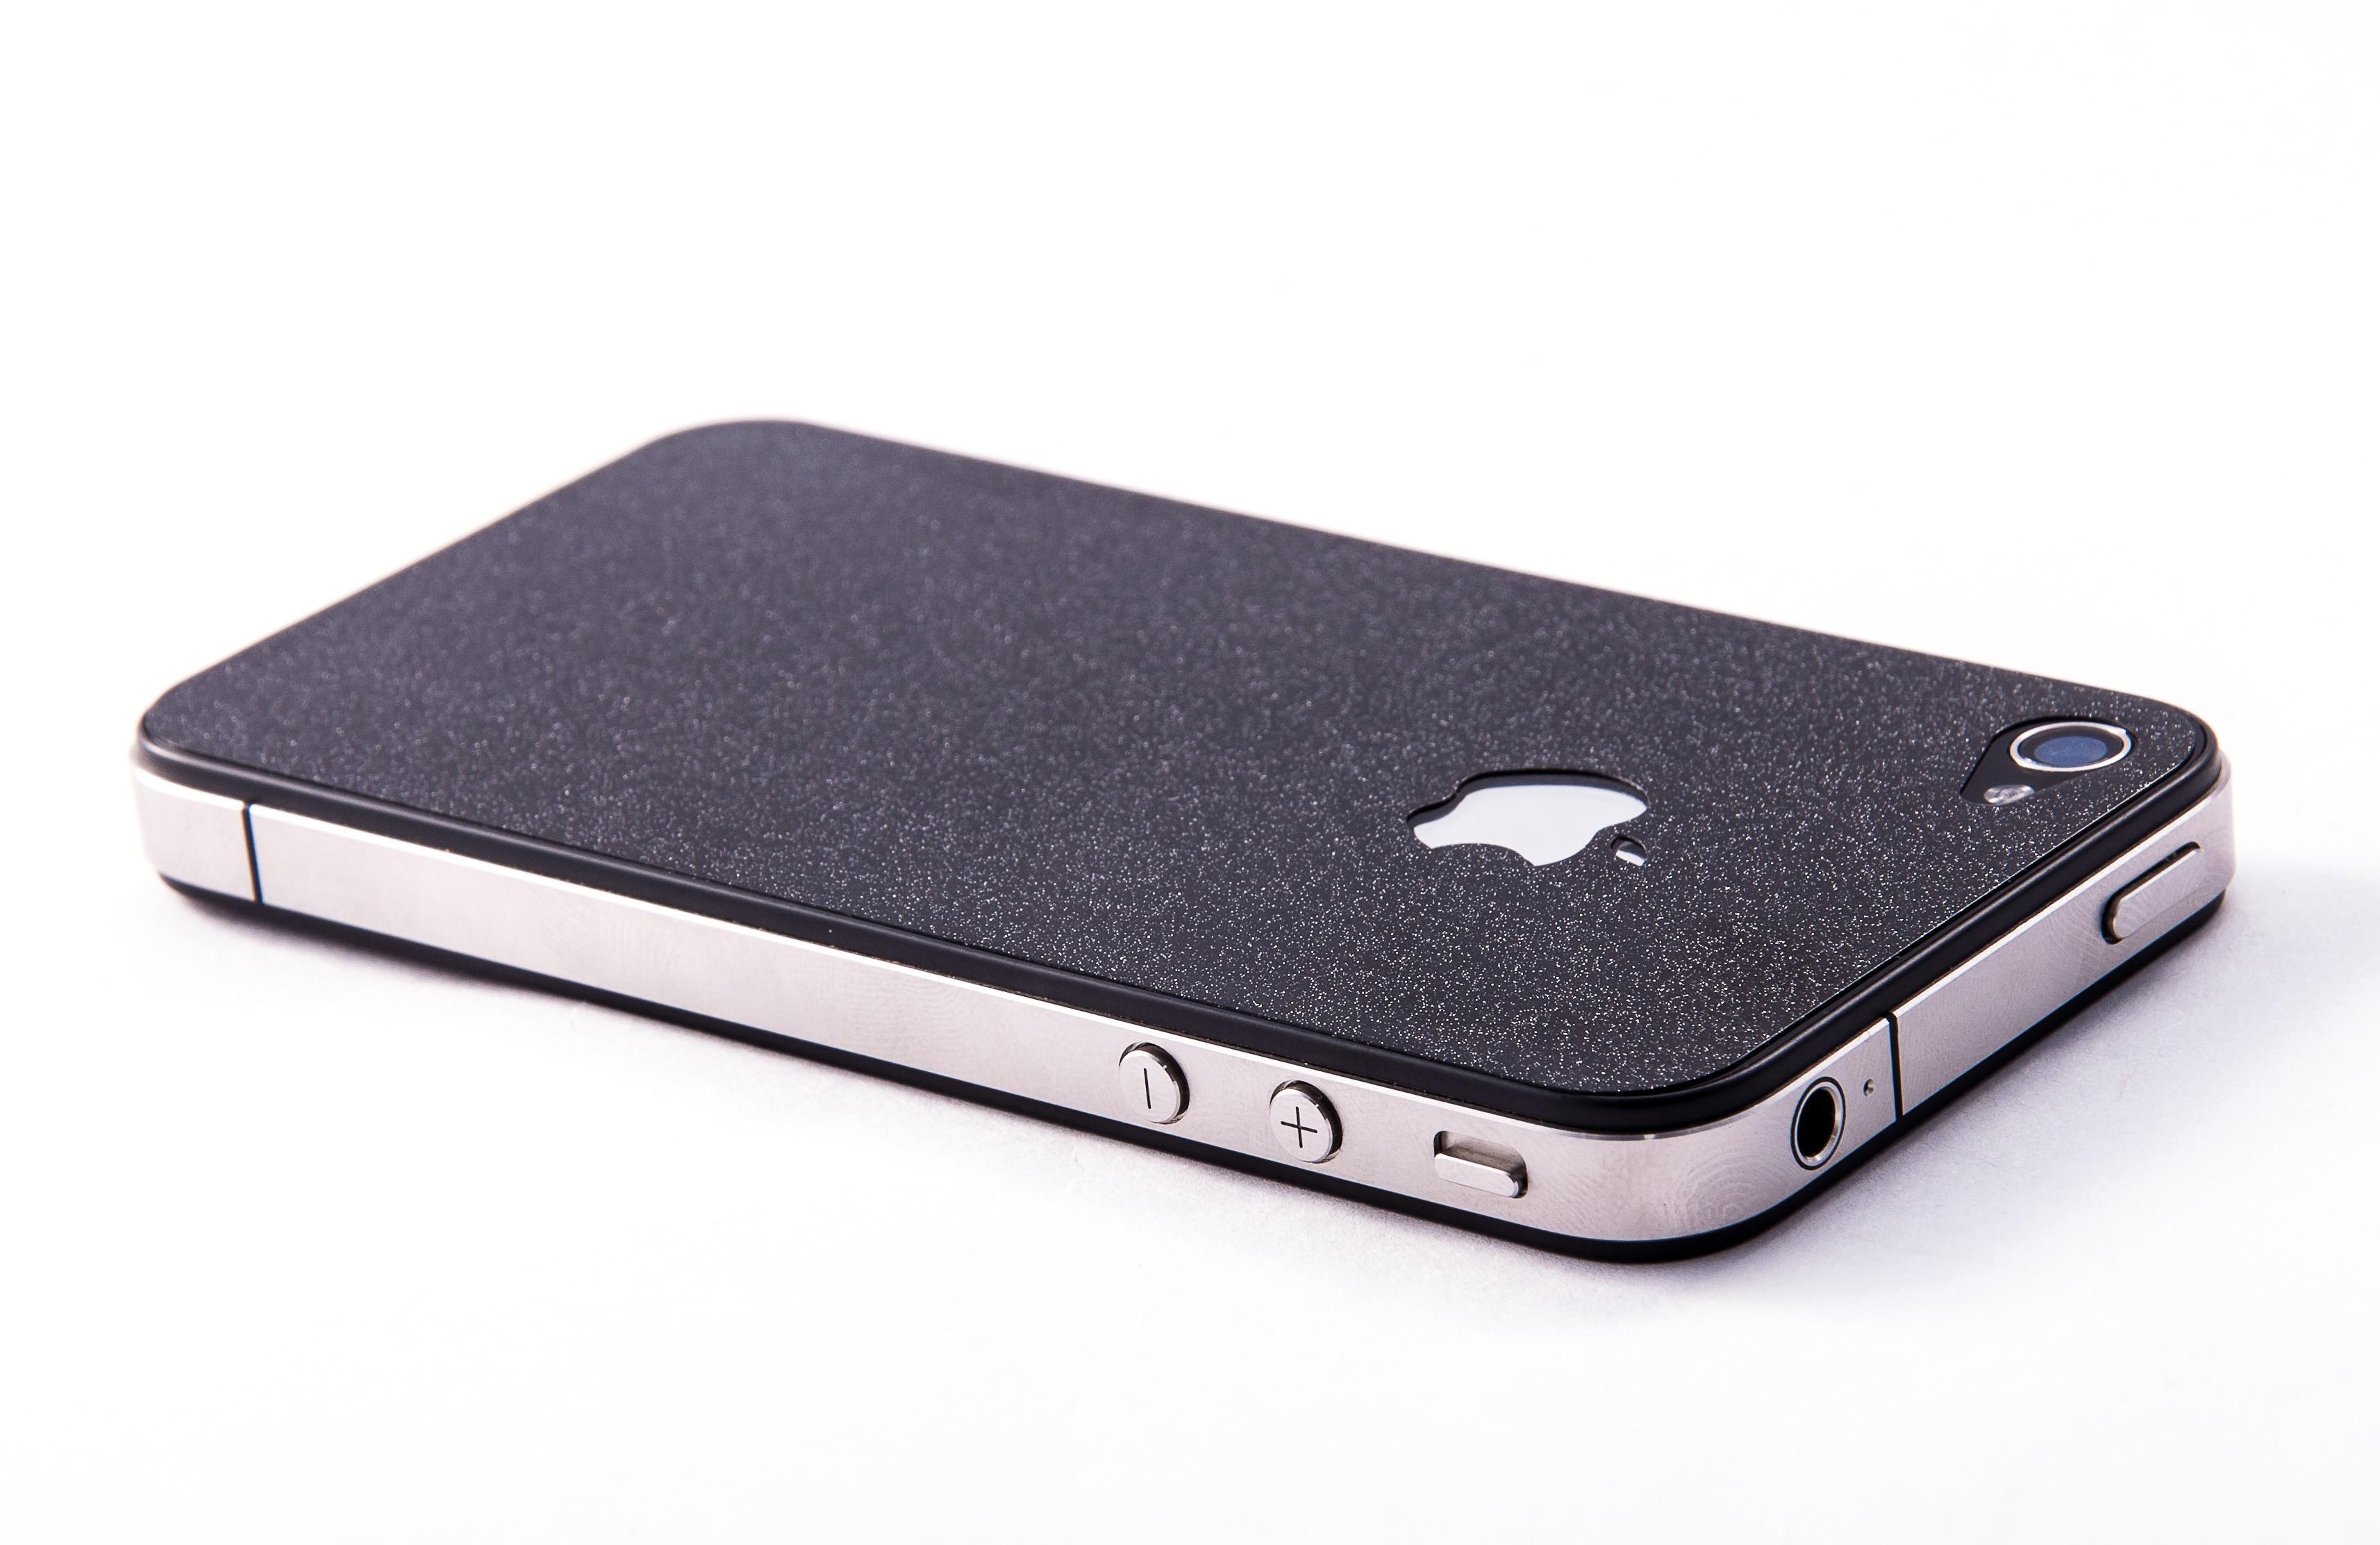 Пленка защитная EGGO iPhone 4/4S Crystalcover black BackSide (черная, перламутровая)